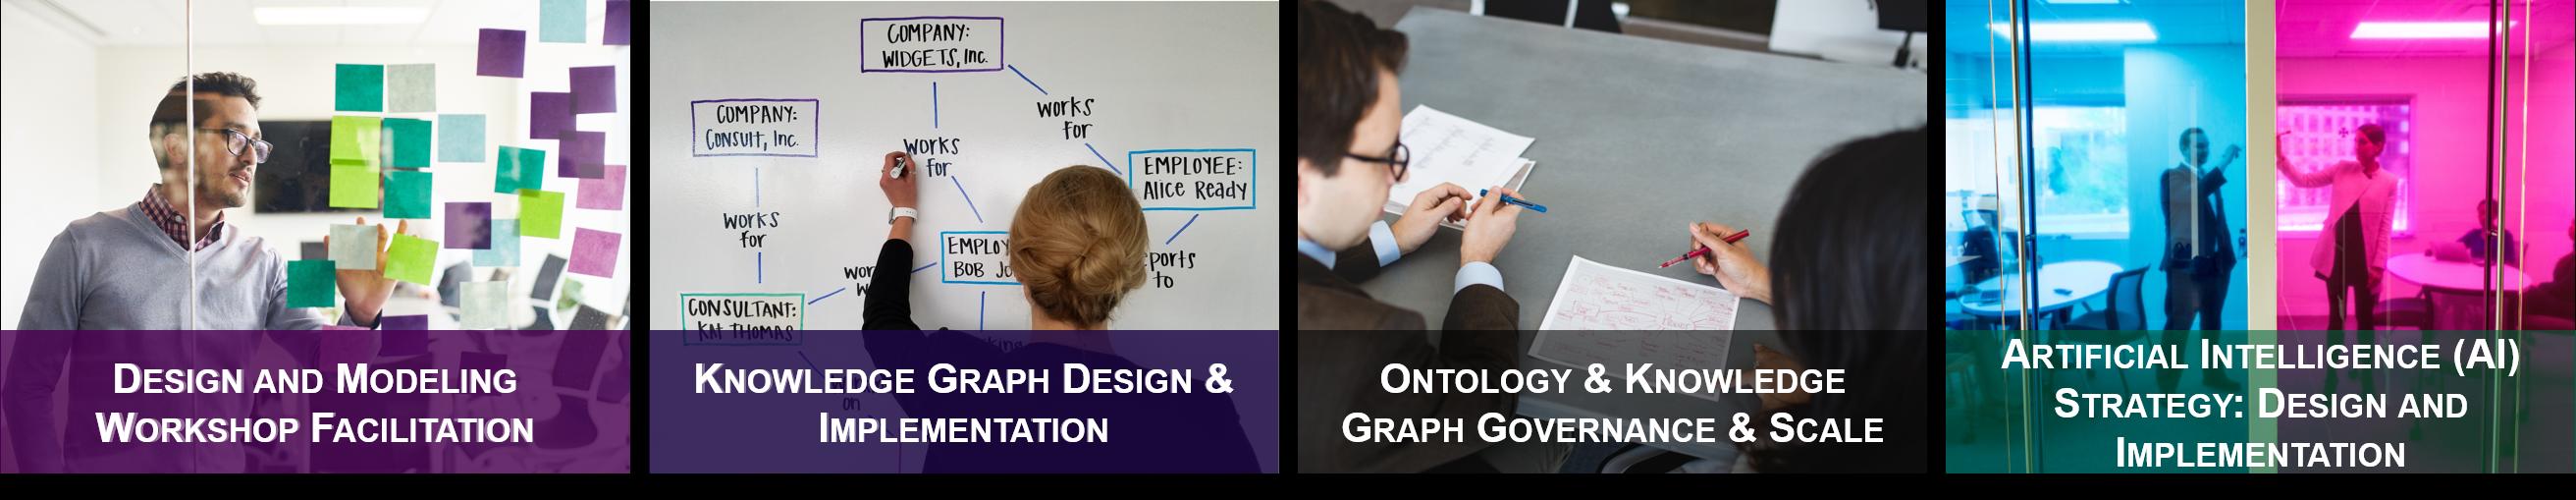 Design, Data Modeling, Semantic Workshop, knowledge Graph Implementation, Ontology Governance & AI Strategy